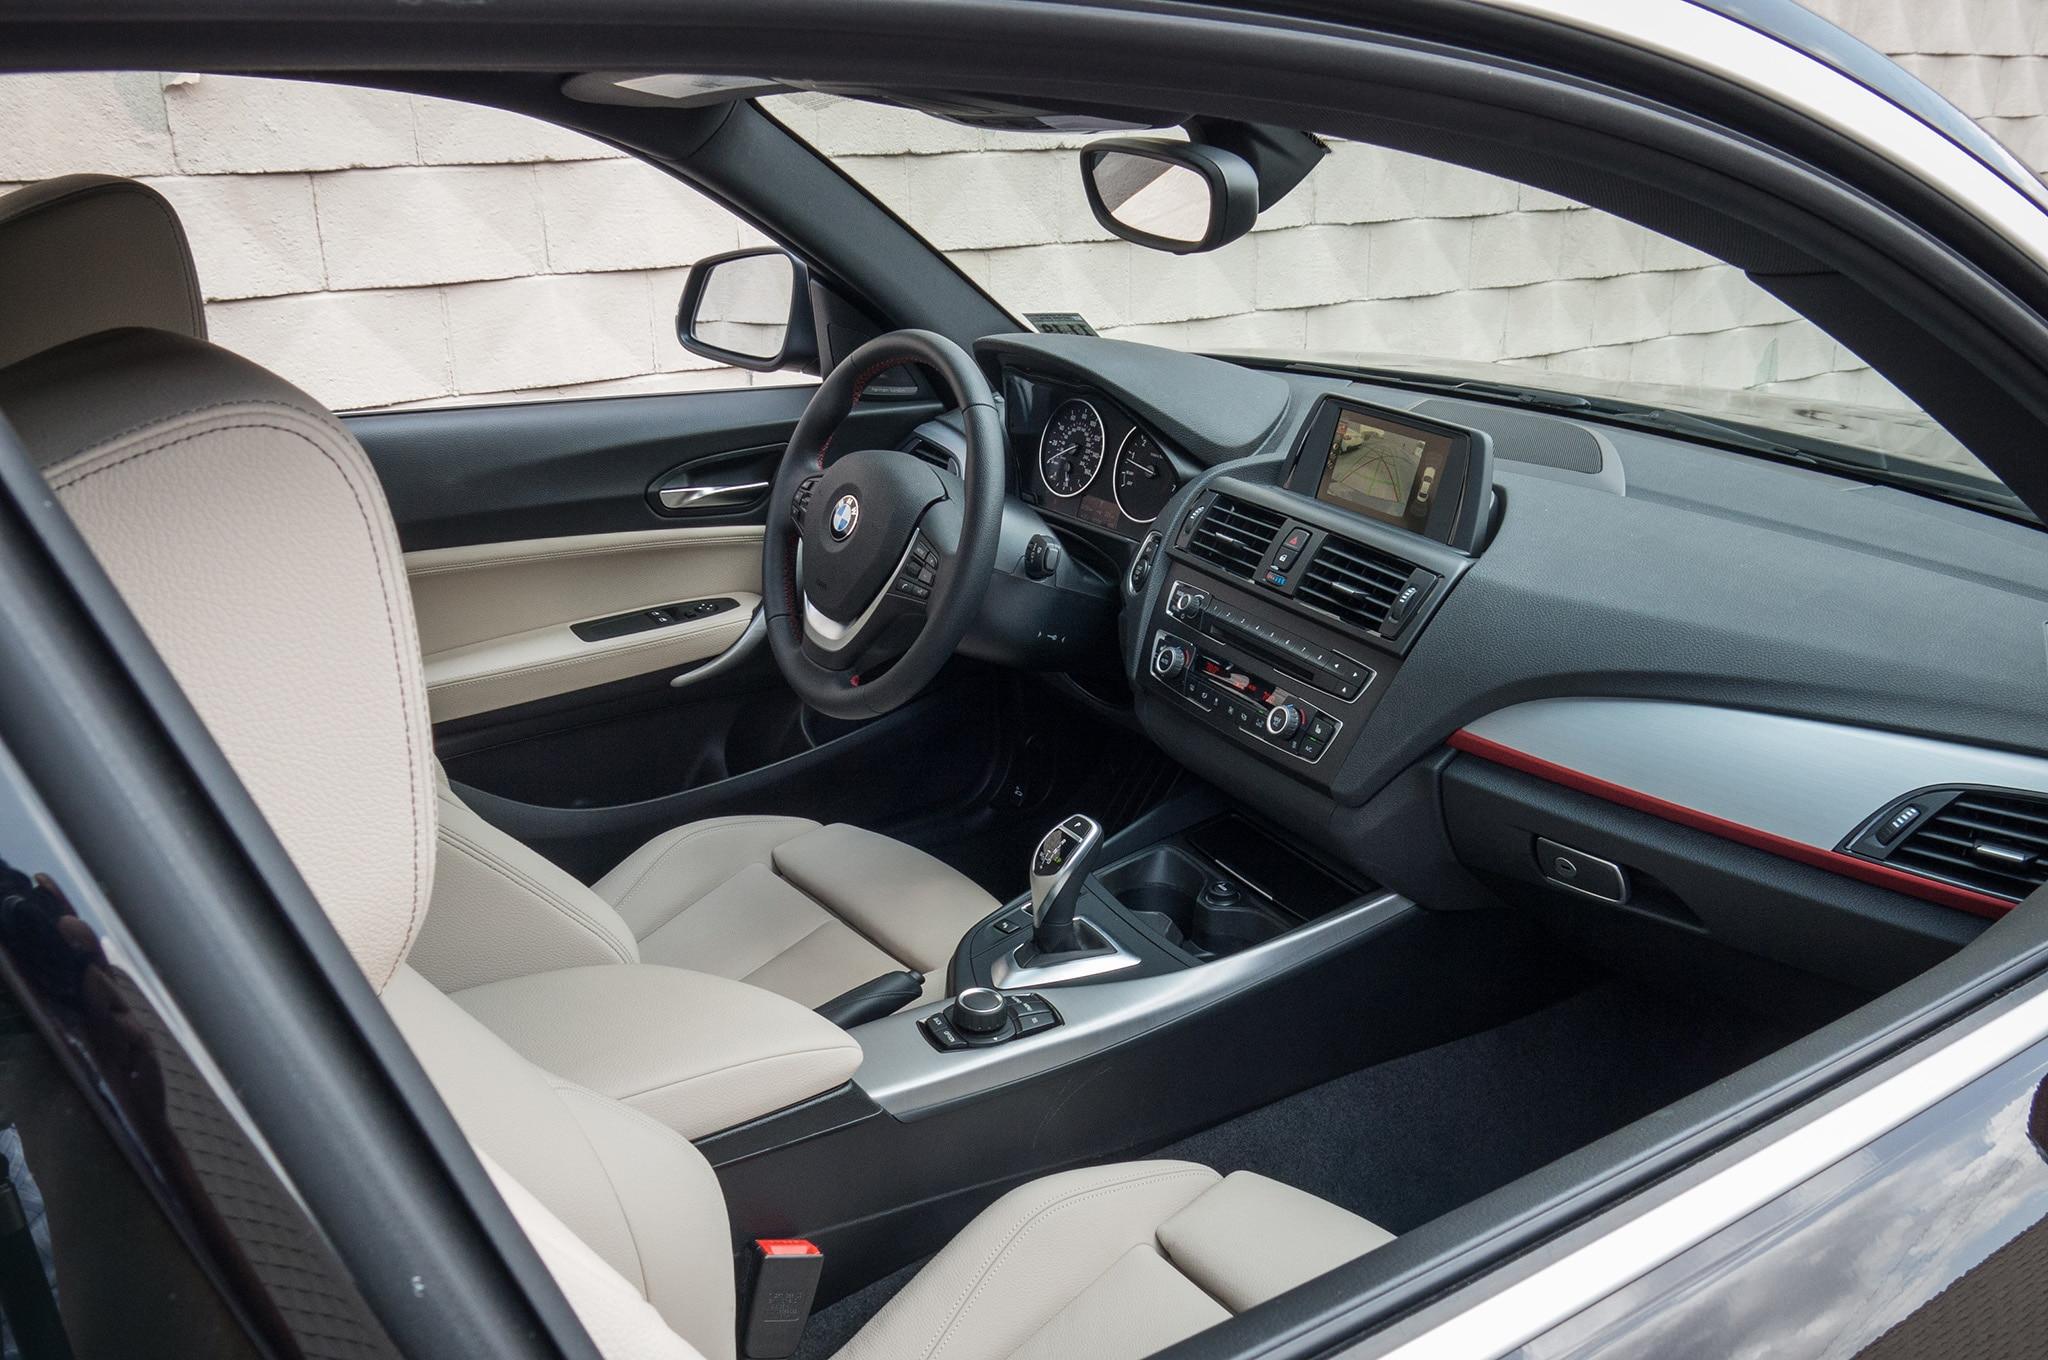 BMW 228I Xdrive >> 2014 BMW M235i - How Does the BMW 228i Compare?